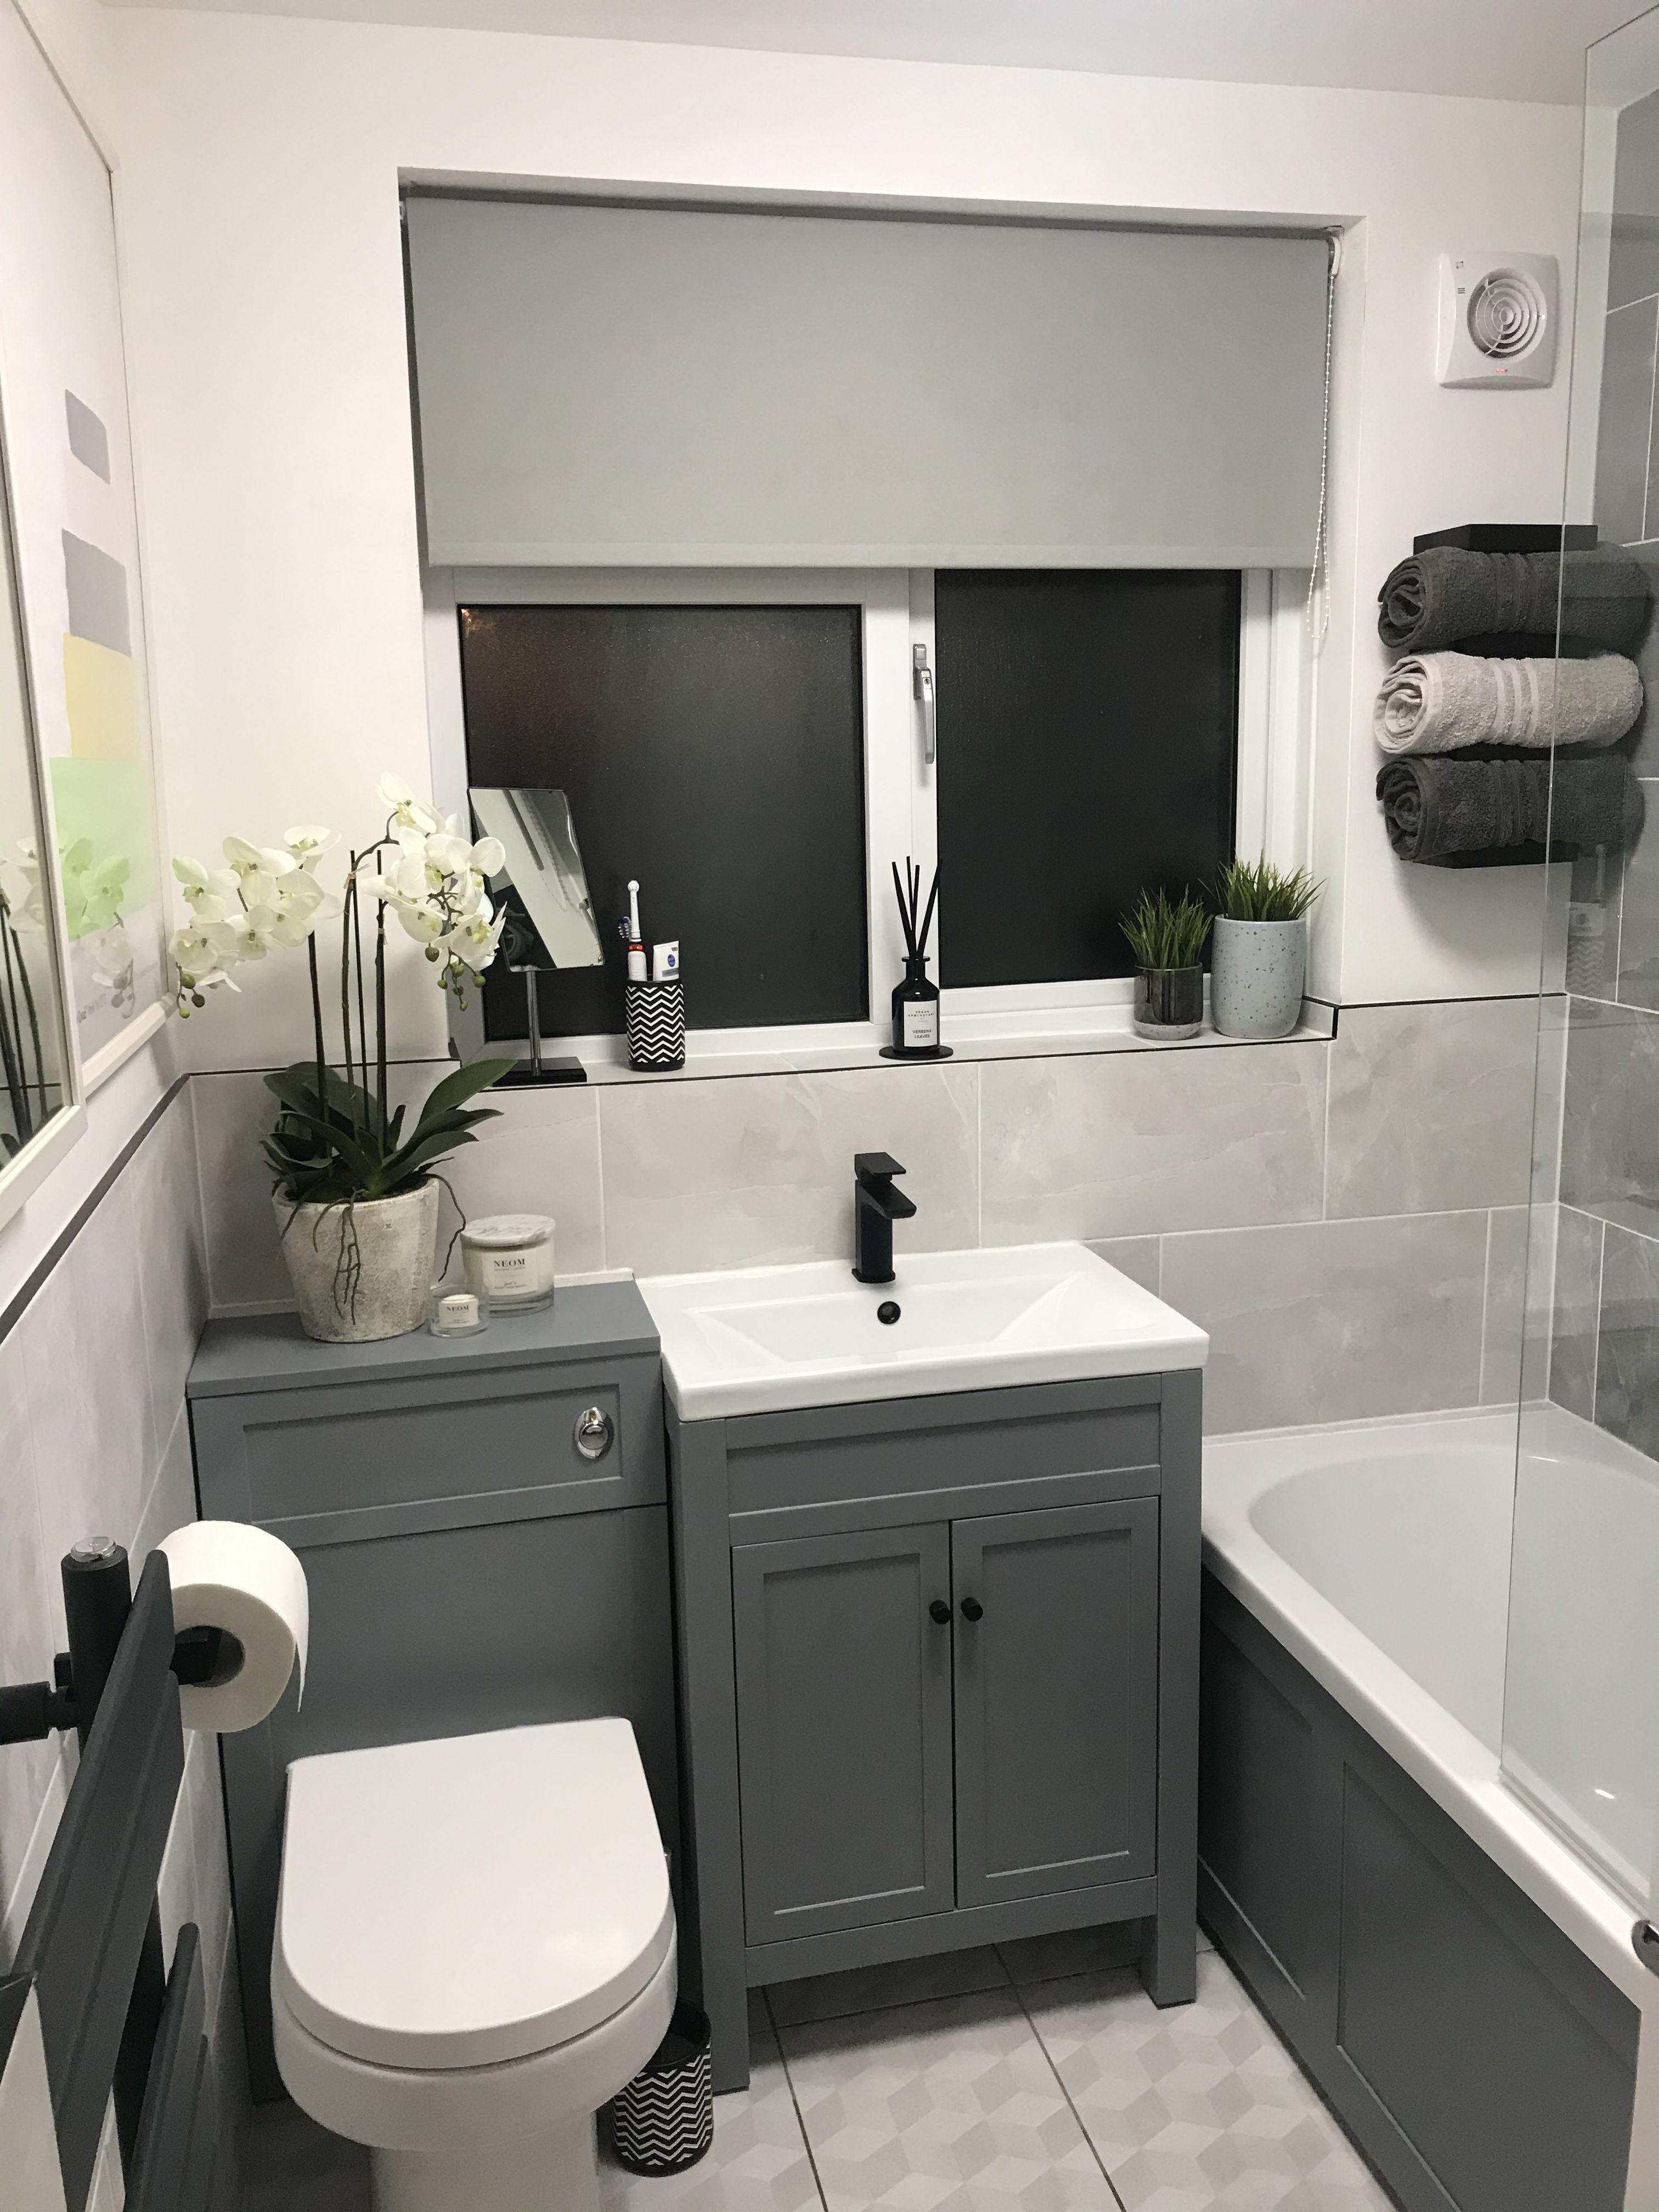 Grey Bathroom Inspo Black Bathroom Decor Gray Bathroom Decor Grey Bathrooms Grey decor for bathroom